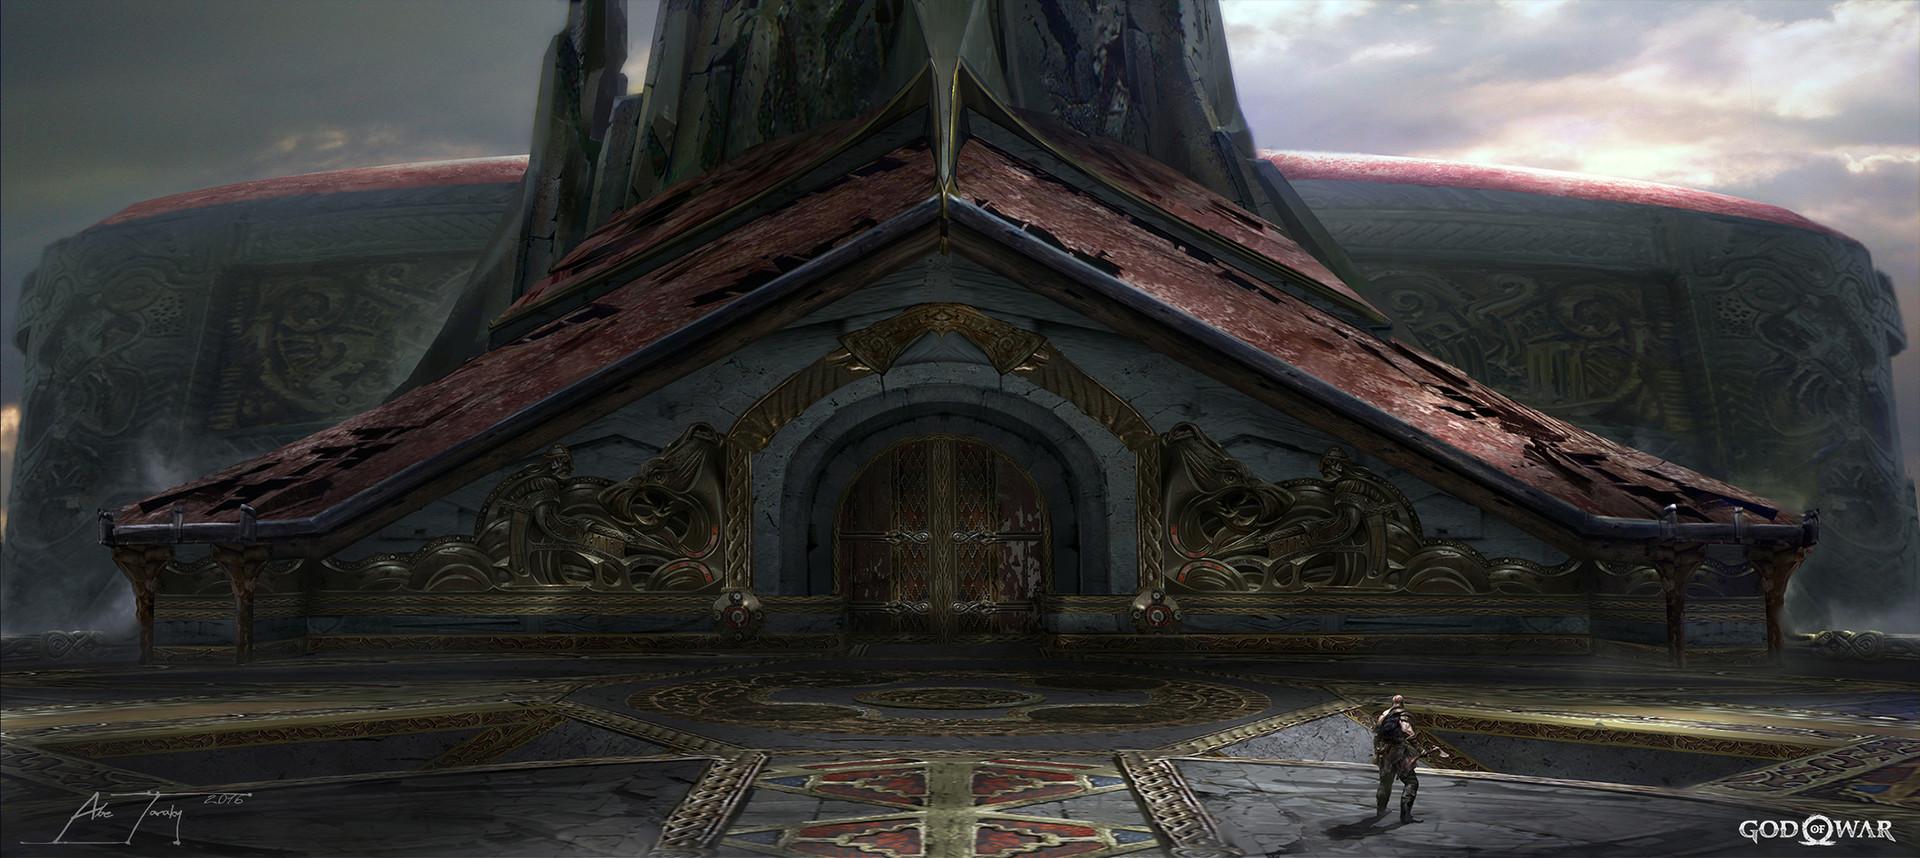 abe-taraky-tyr-temple-entrance-abe-taraky-01b.jpg